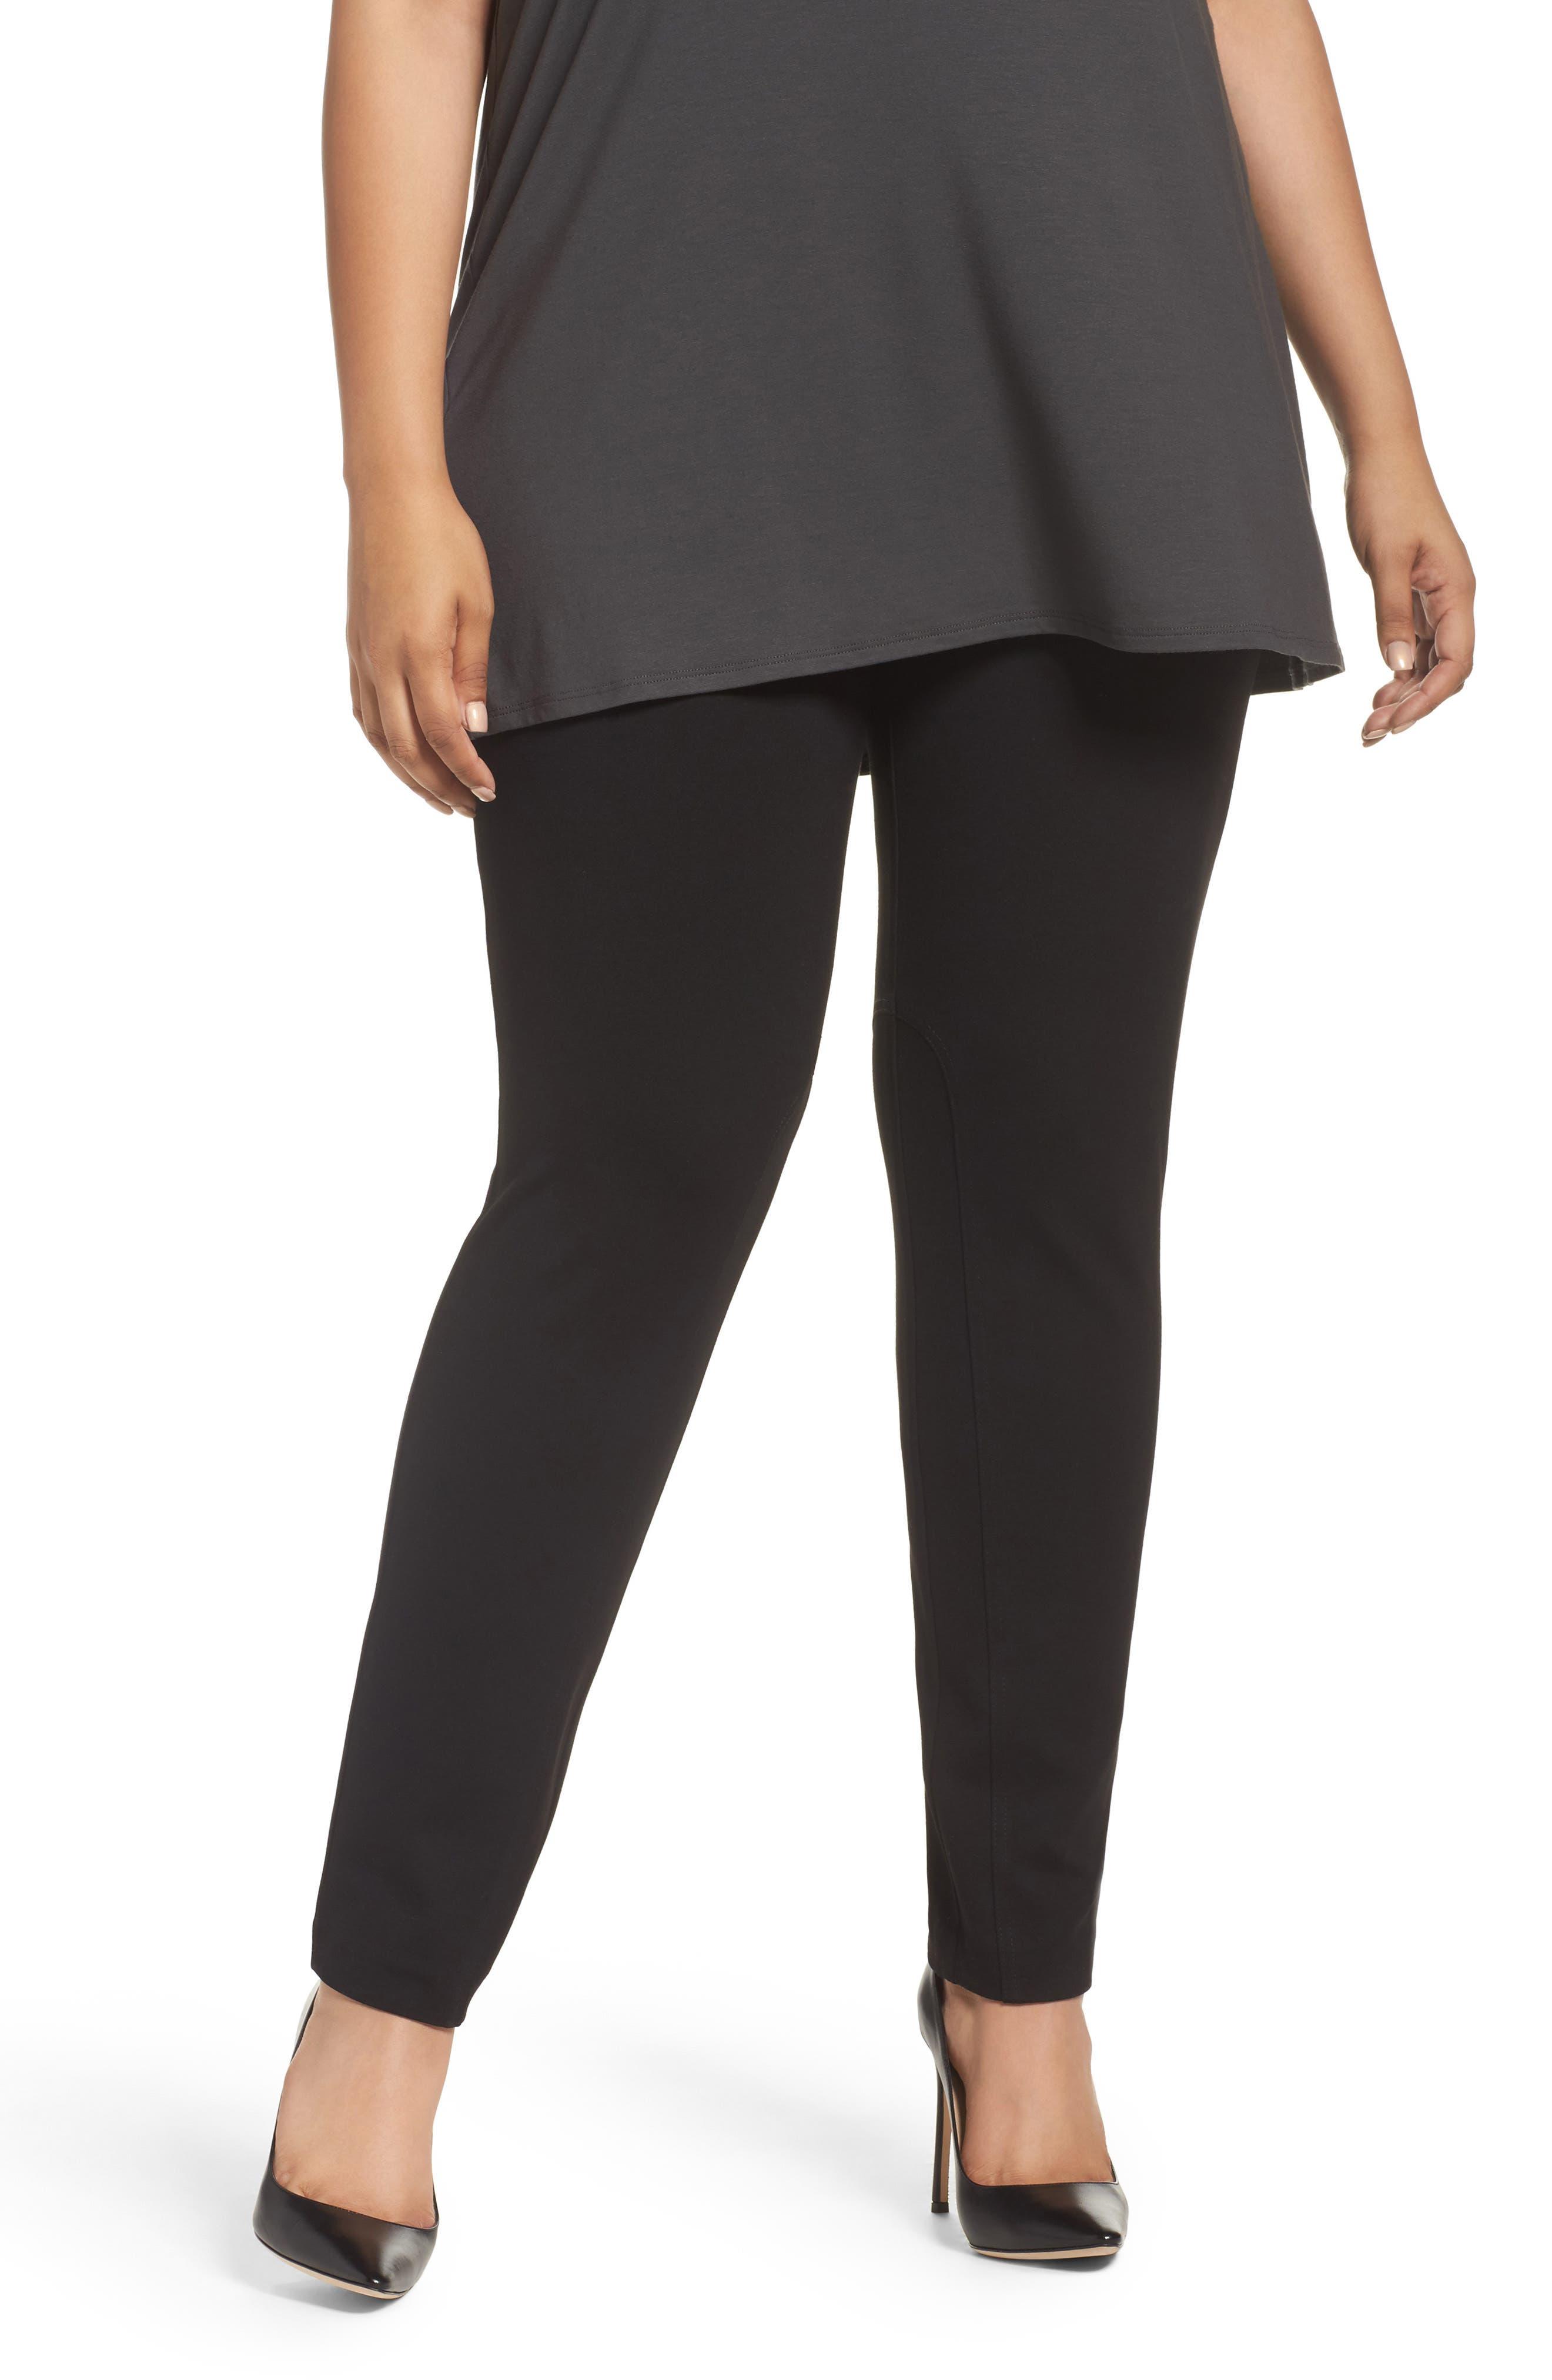 Alternate Image 1 Selected - Foxcroft Naomi Ponte Jodphur Pants (Plus Size)